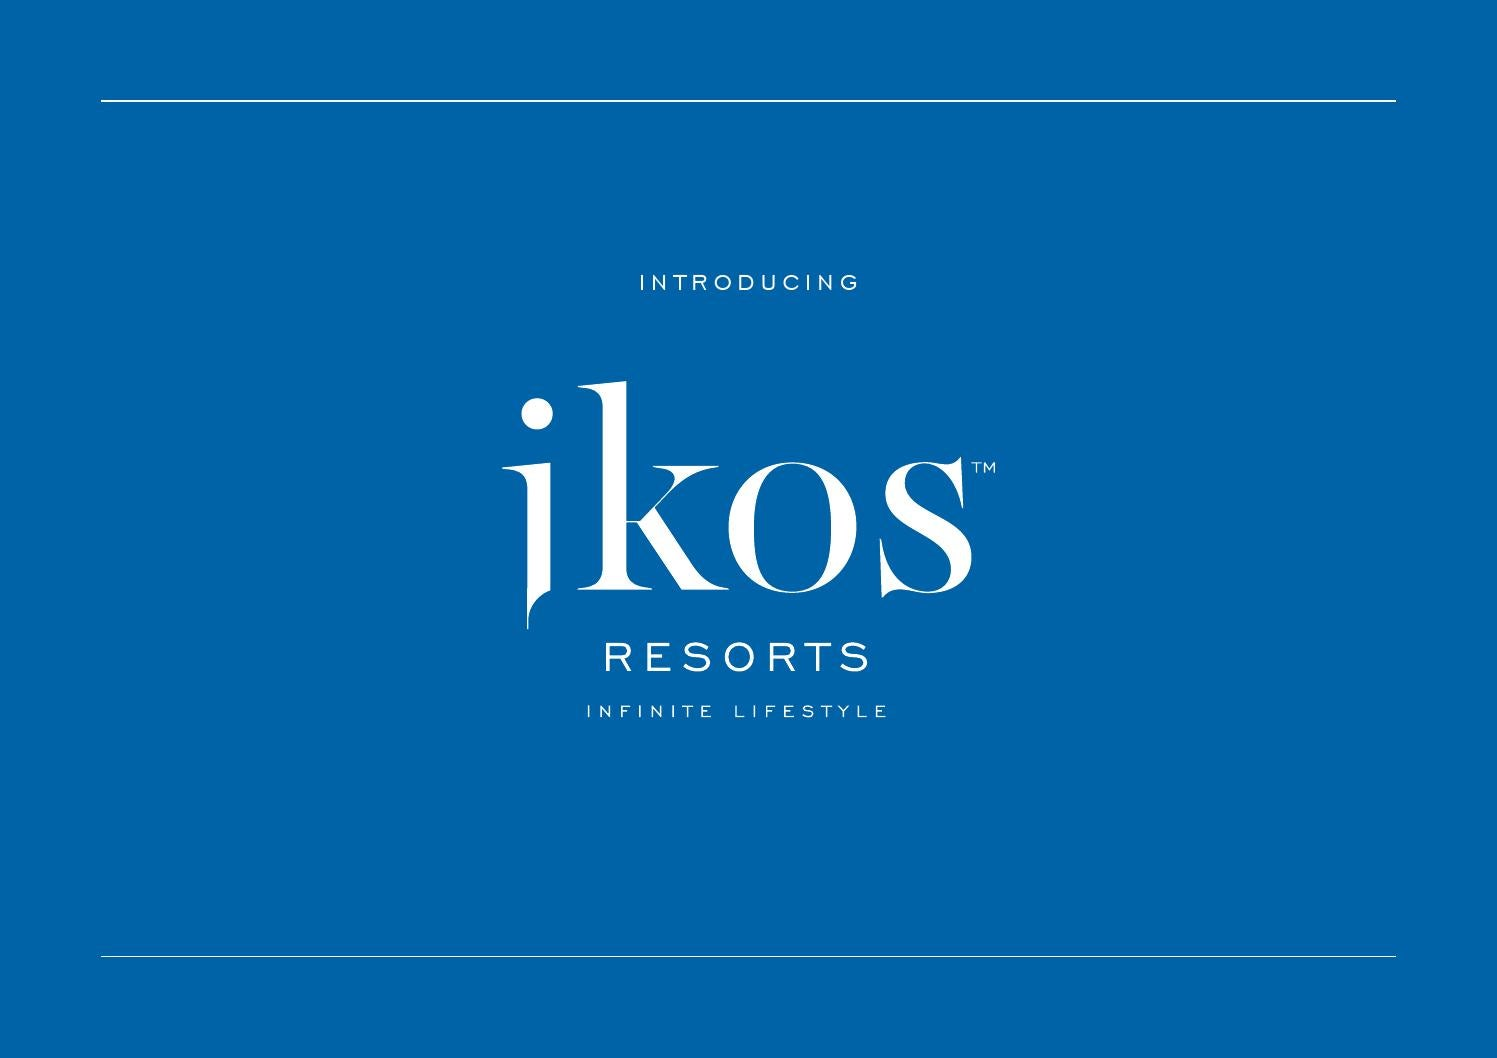 Ikos Resorts Corporate Presentation By Ikos Resorts Issuu